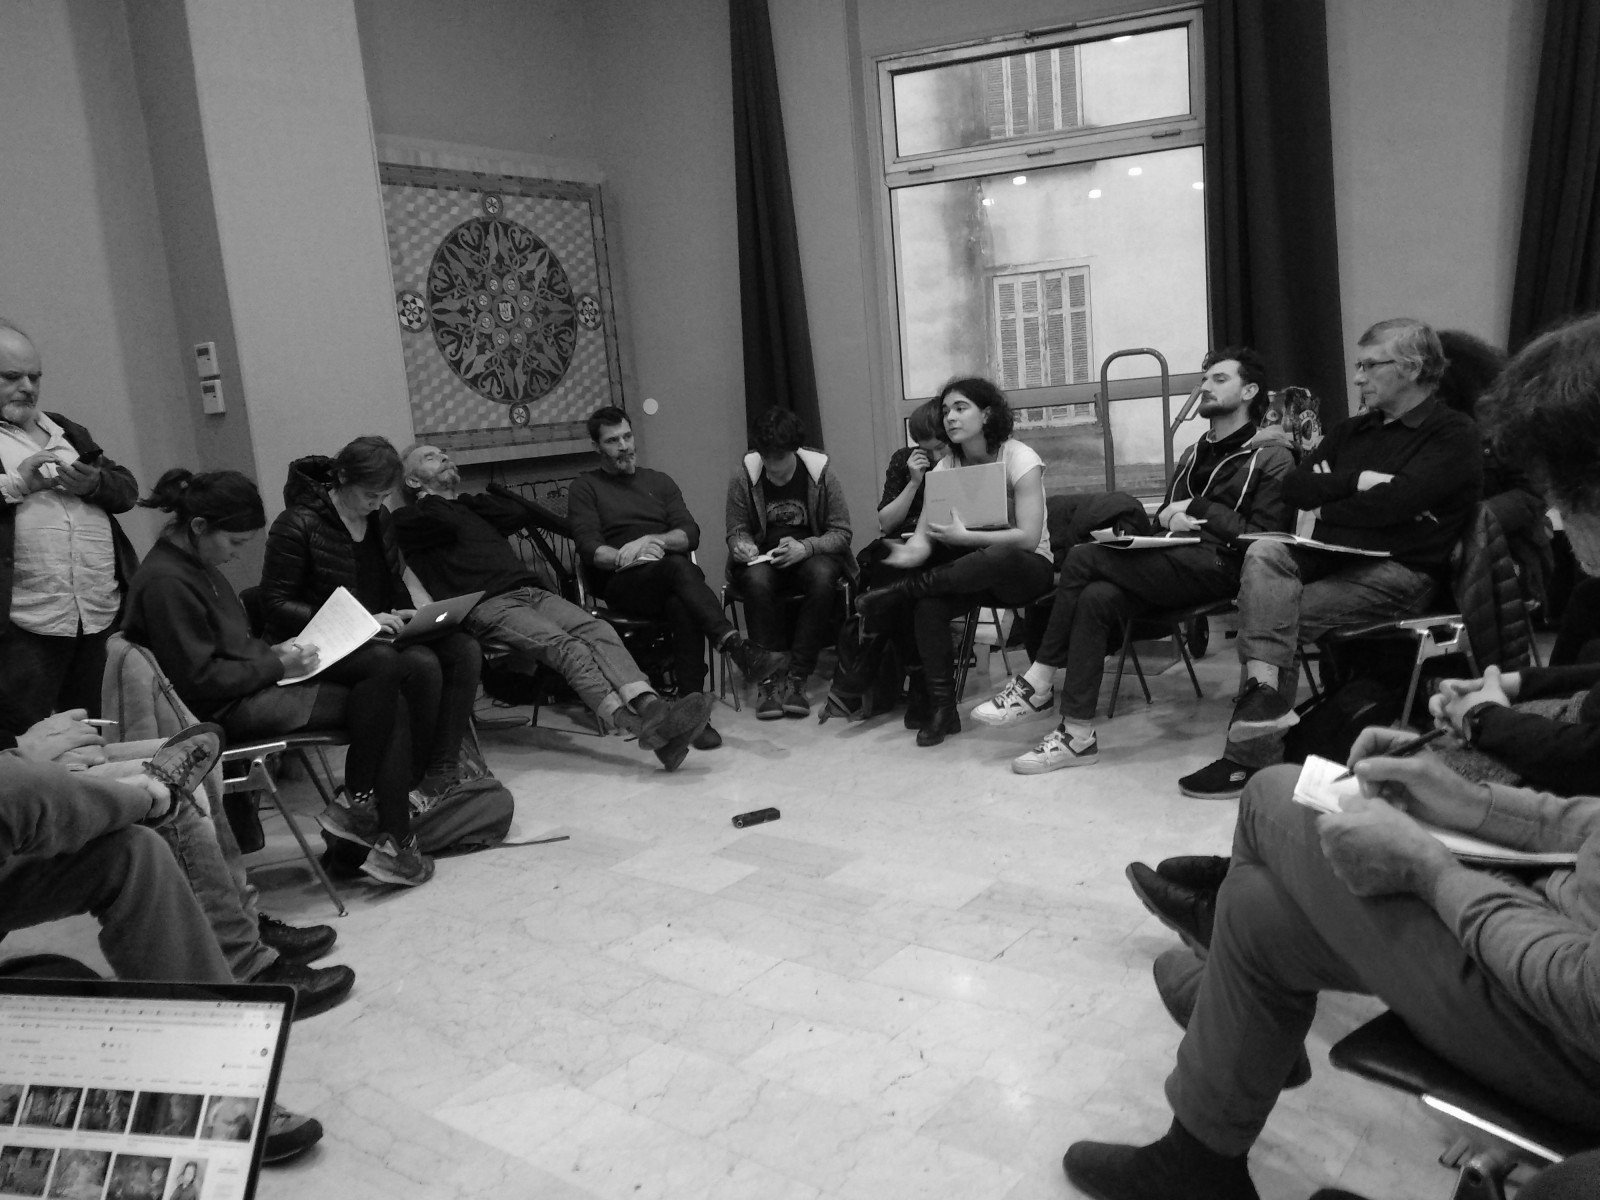 commonscamp 2020 Marsella